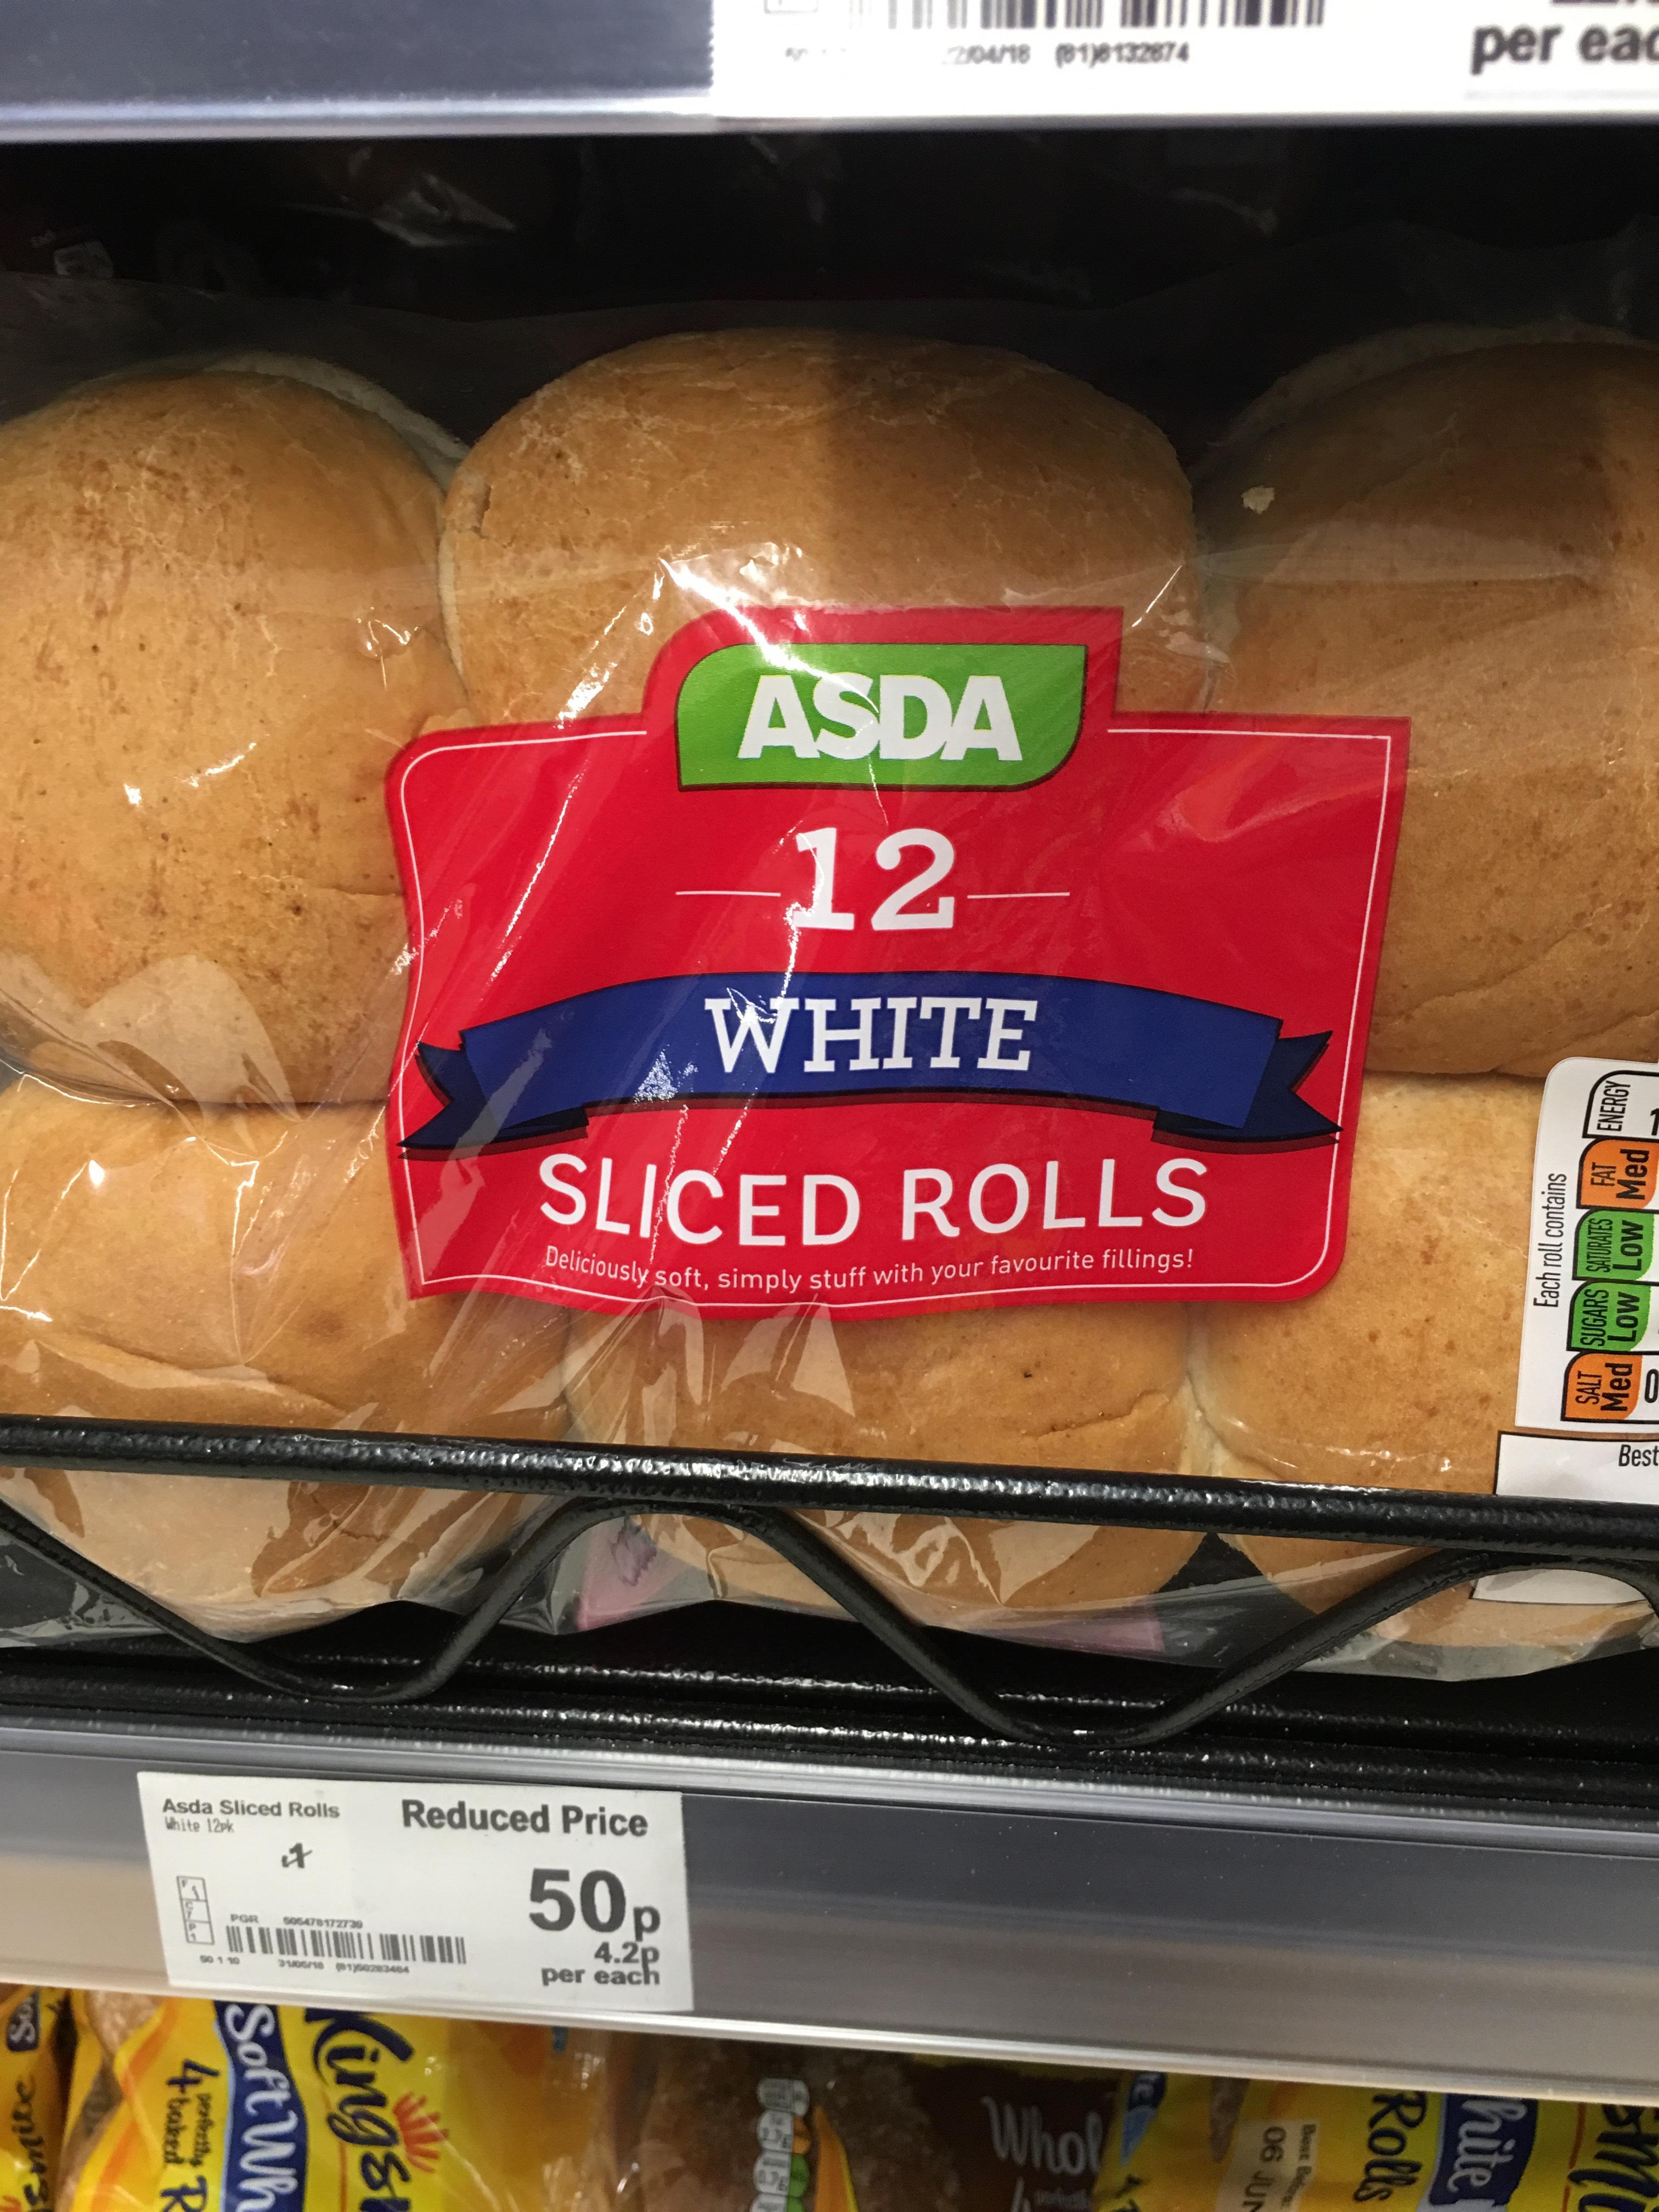 [Reduced Price] Sliced Rolls Pack x 12 50p instore at Asda Ruislip